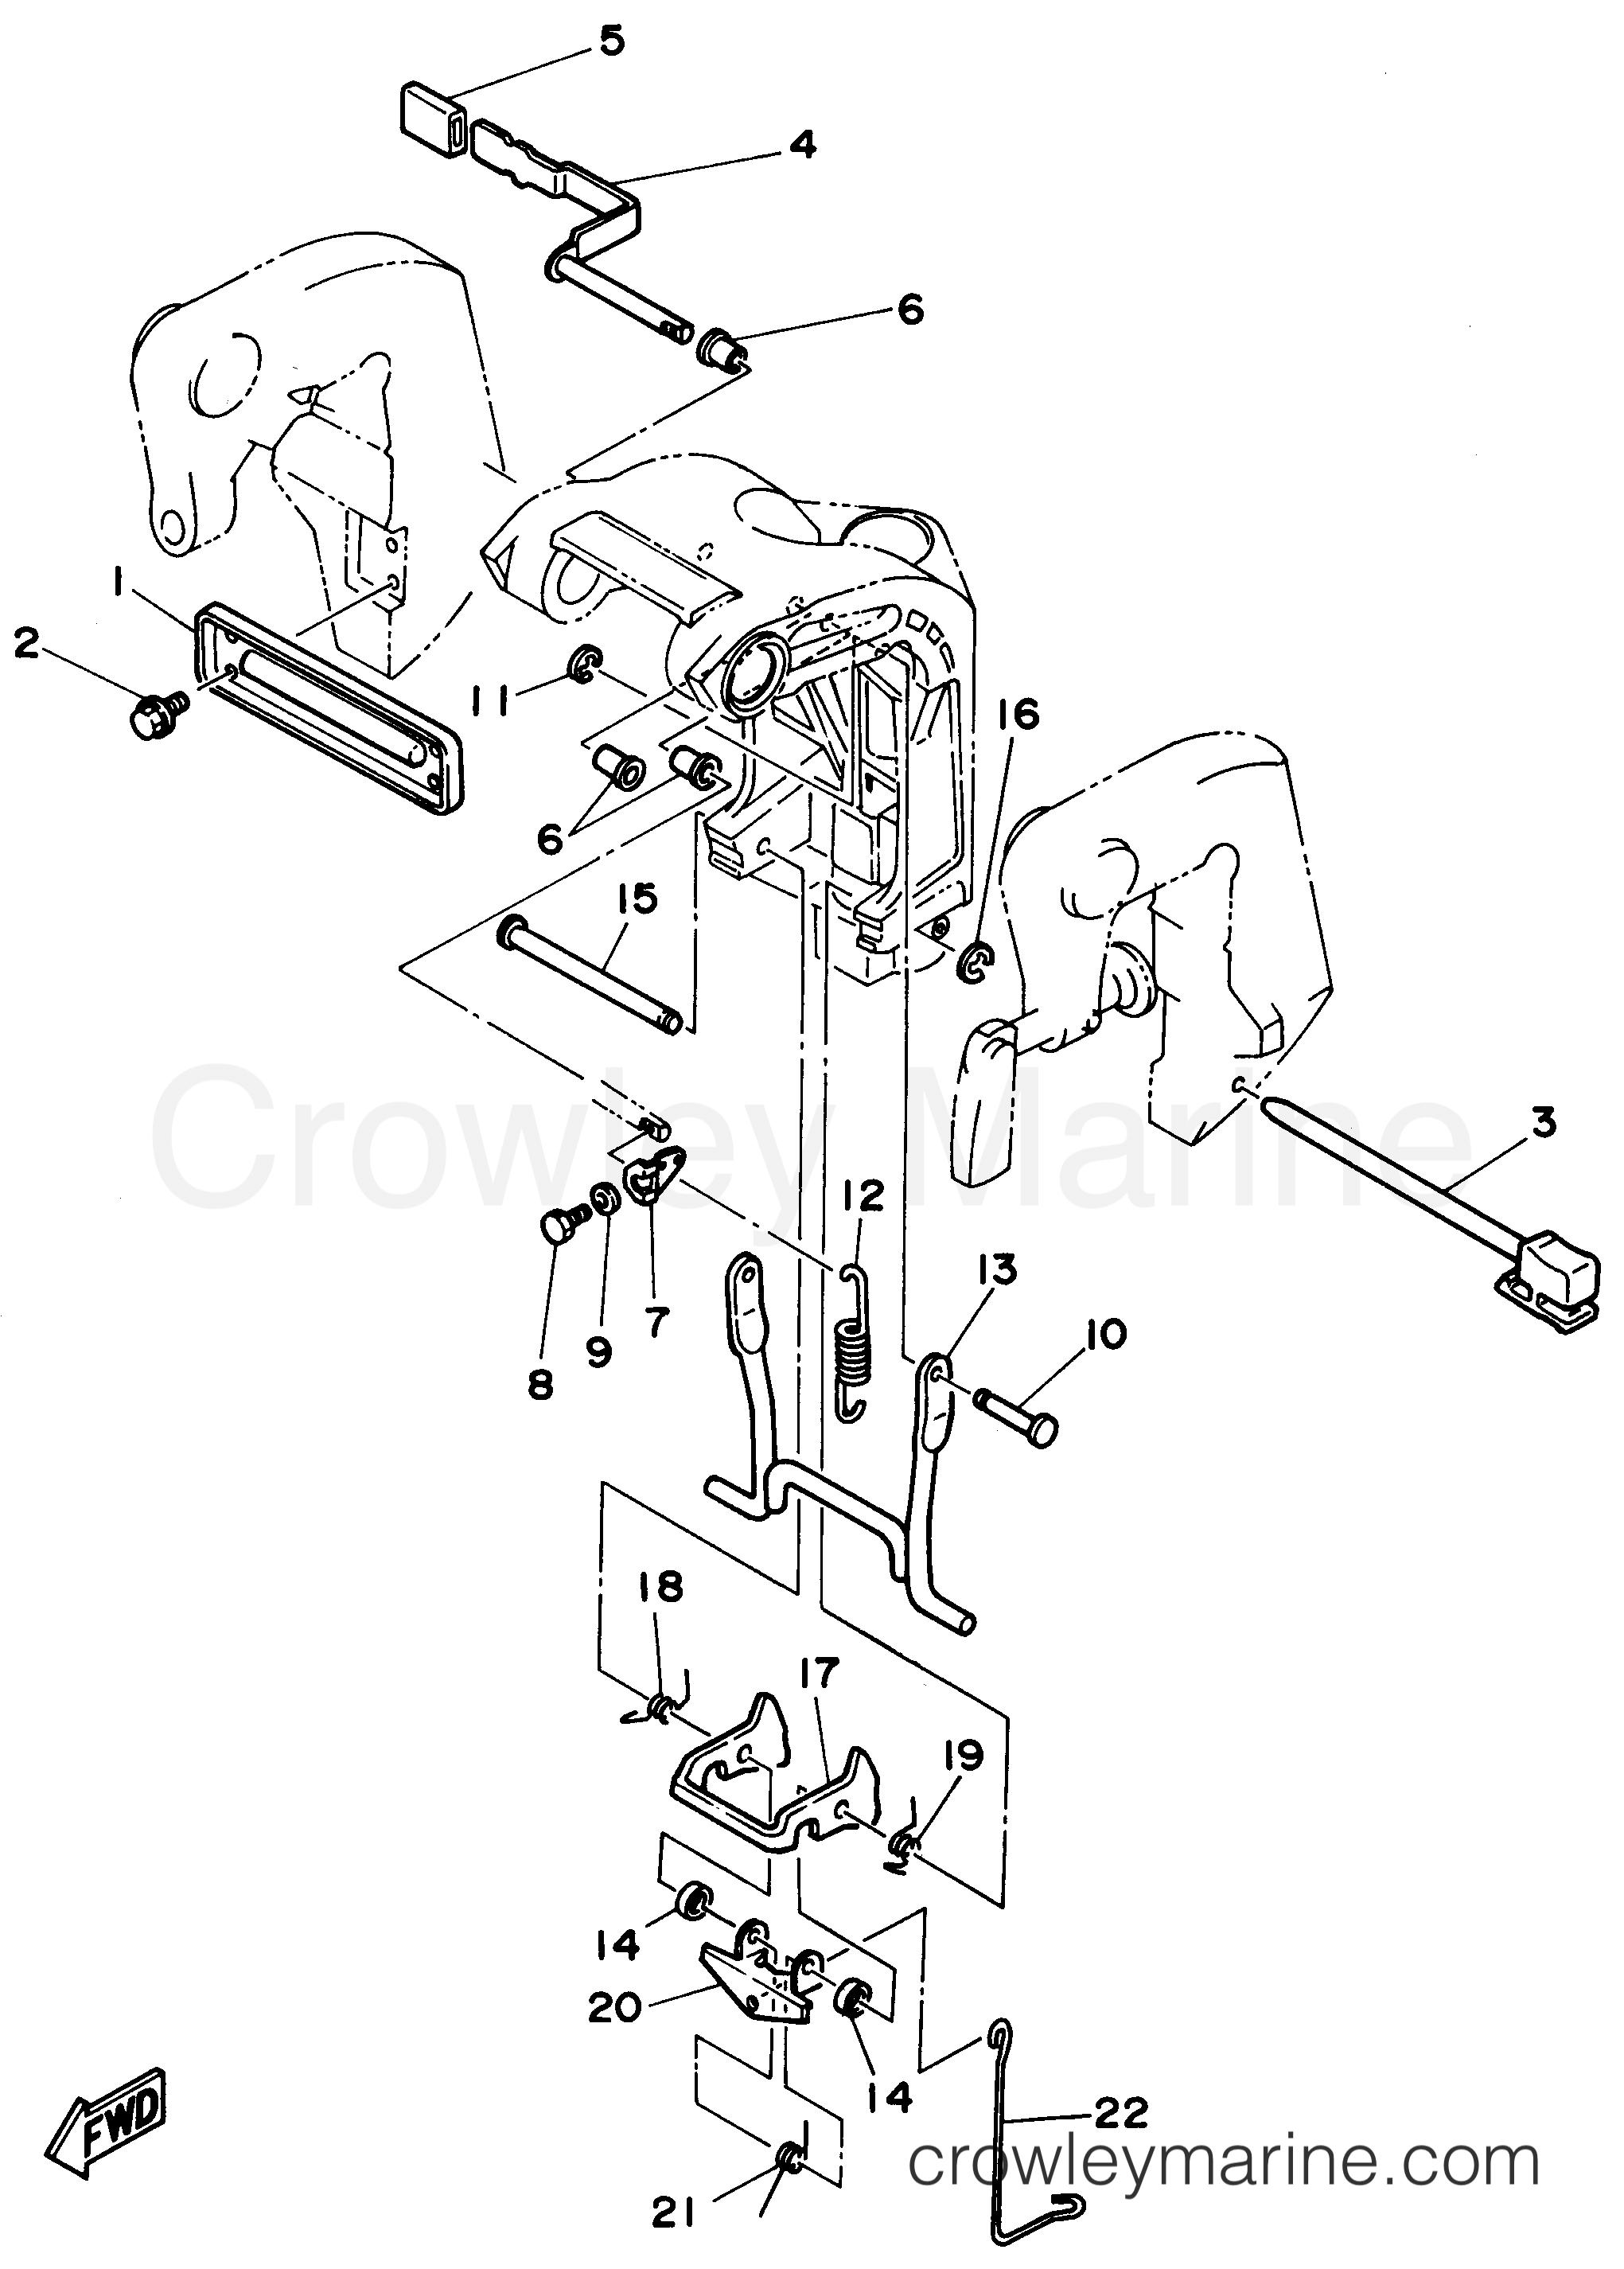 BRACKET 2 - 1996 Yamaha Outboard 20hp 20MLHU | Crowley Marine